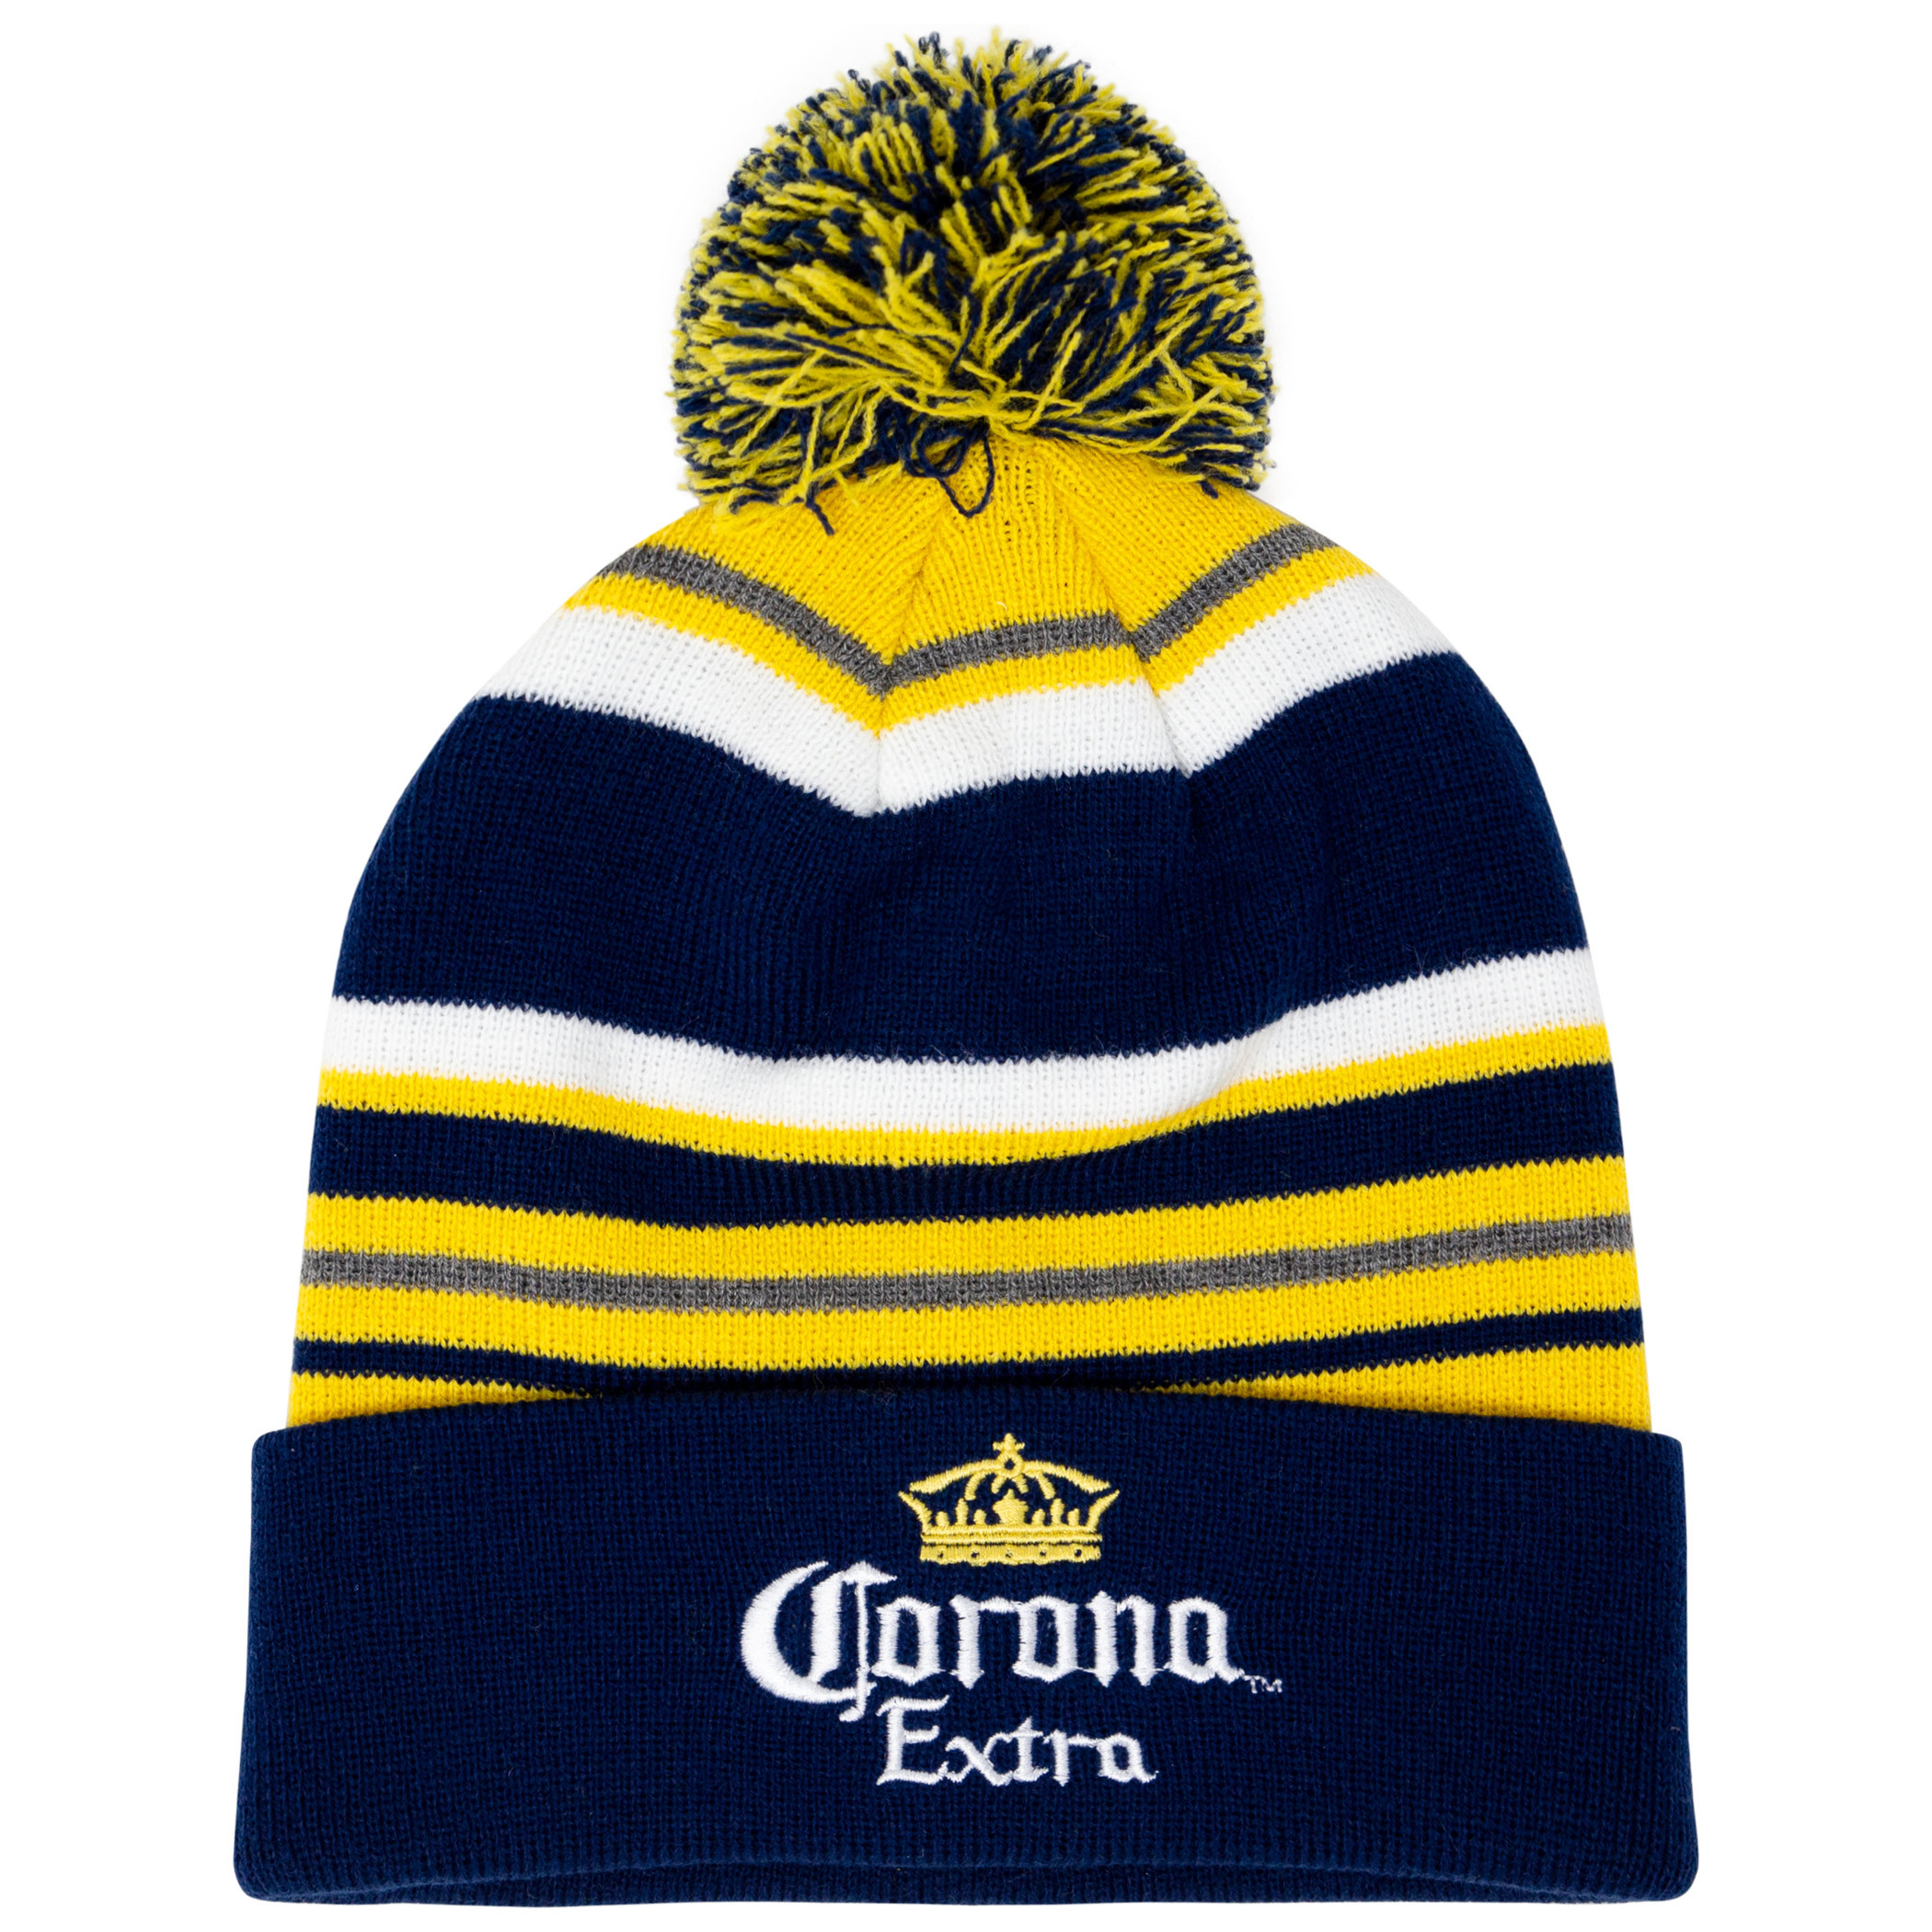 Corona Beer Yellow And Black Winter Pom Beanie